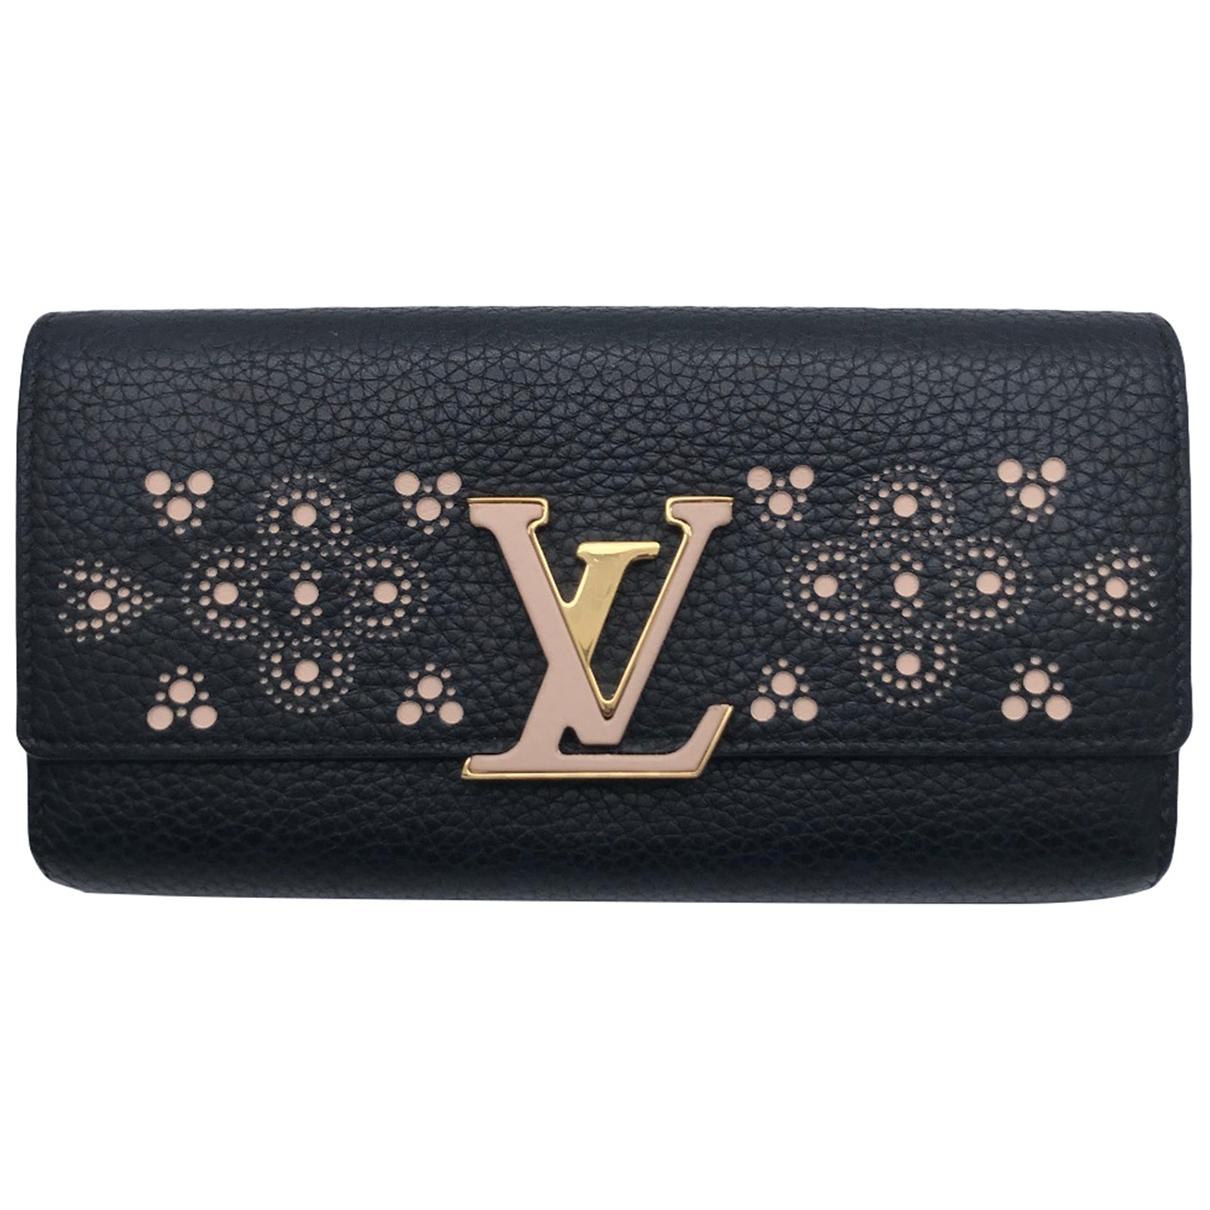 Louis Vuitton Capucines Portemonnaie in  Schwarz Leder